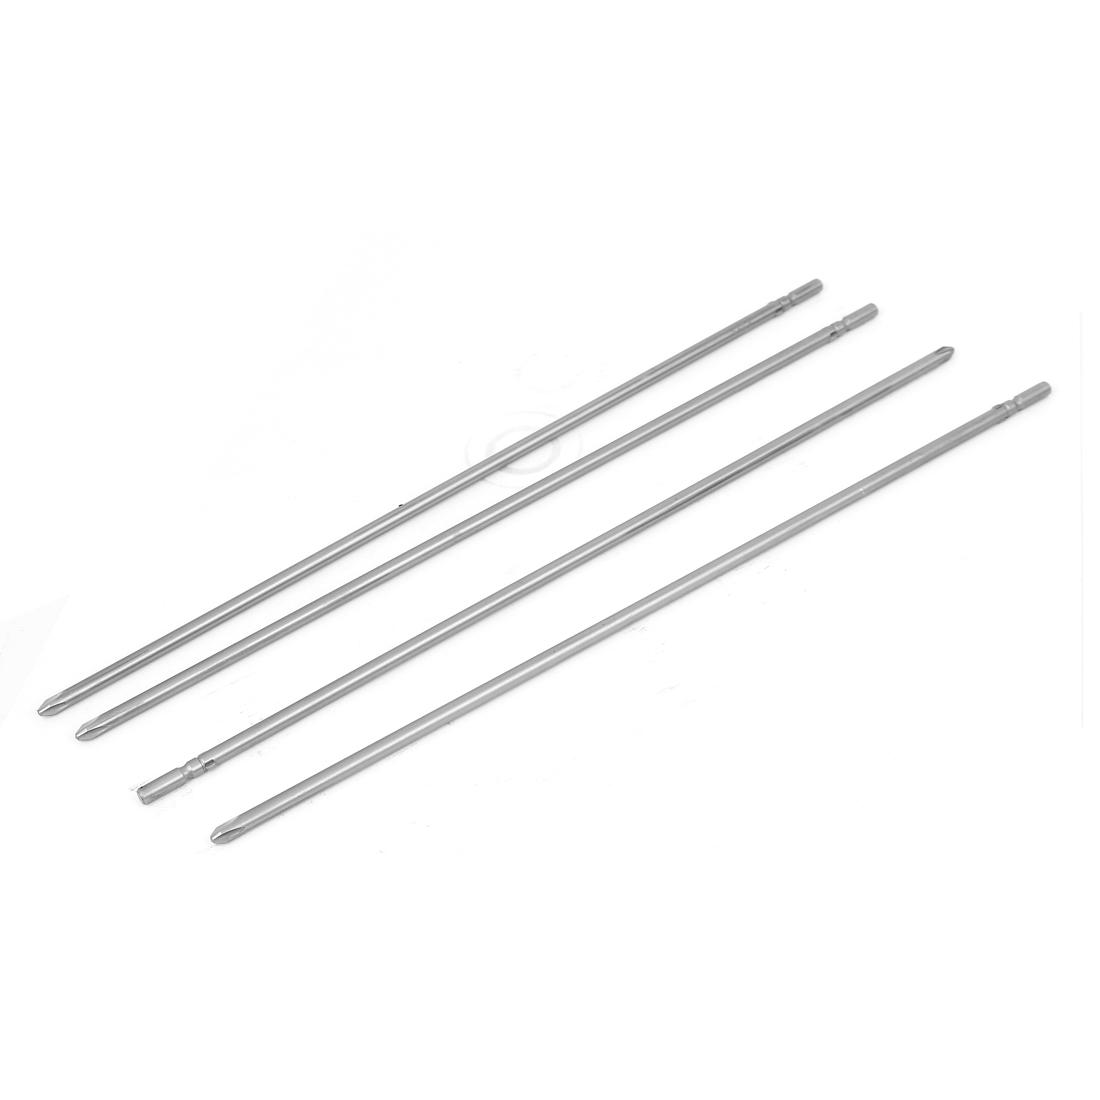 Magnetic PH2 5mm Phillips Cross Head Screwdriver Bit Tool 300mm Length 4pcs